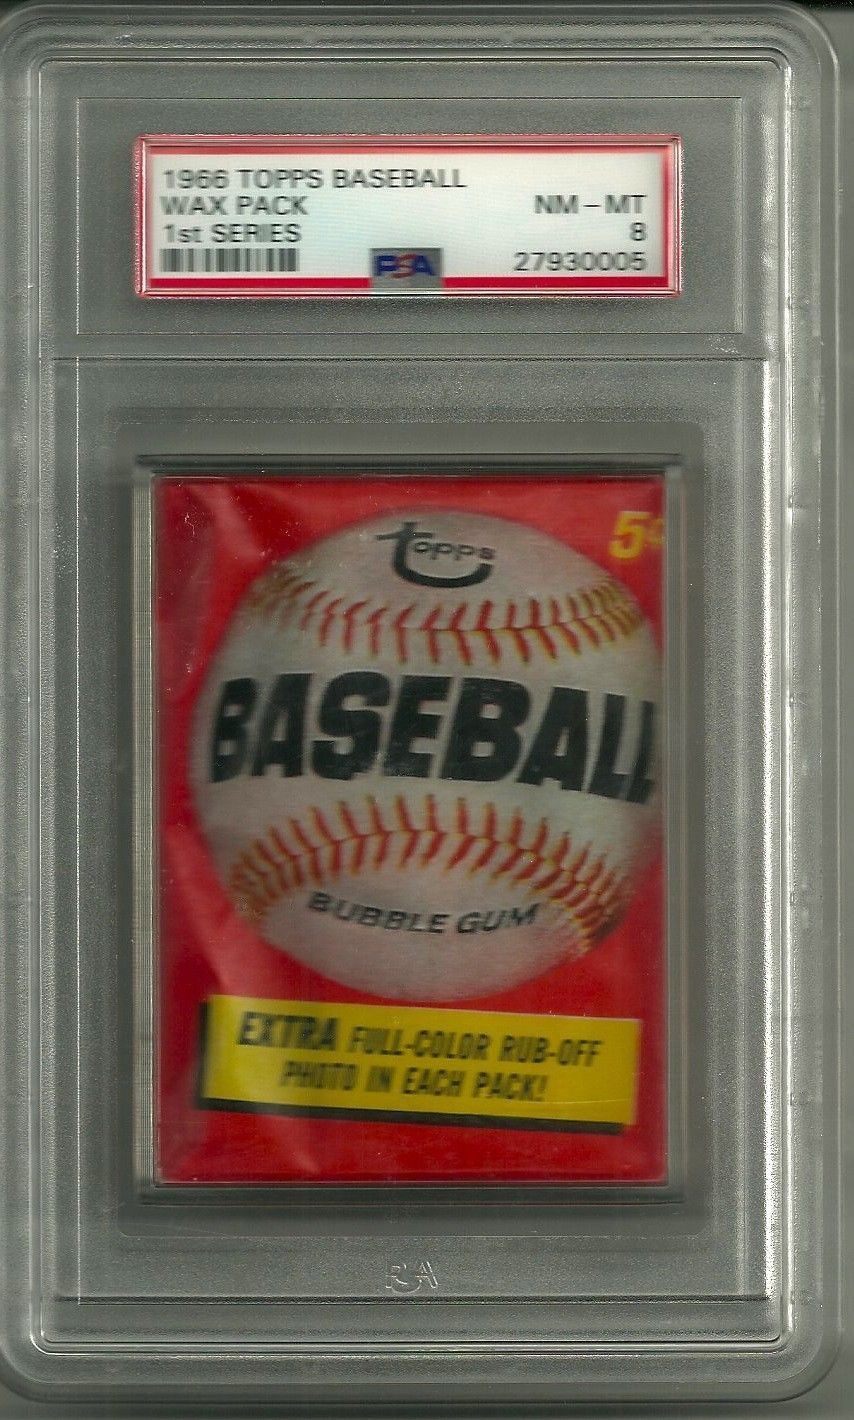 1966 Topps Baseball Wax Pack